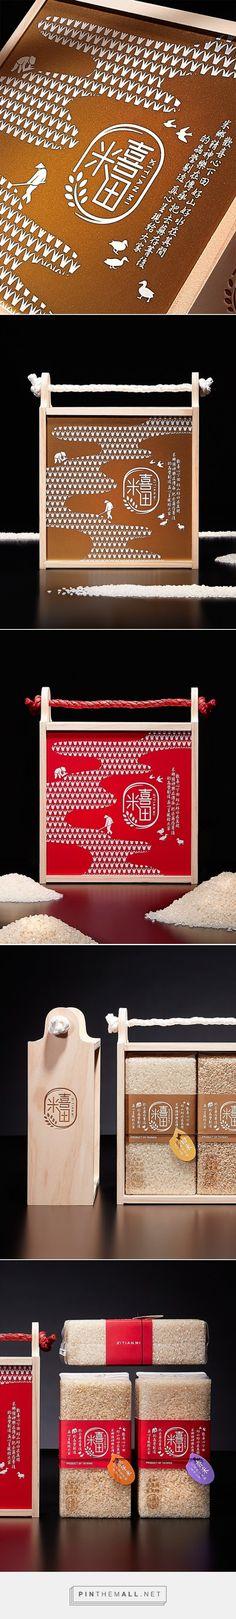 Xitian Mi rice packaging designed by Akun - http://www.packagingoftheworld.com/2015/09/xitian-mi.html